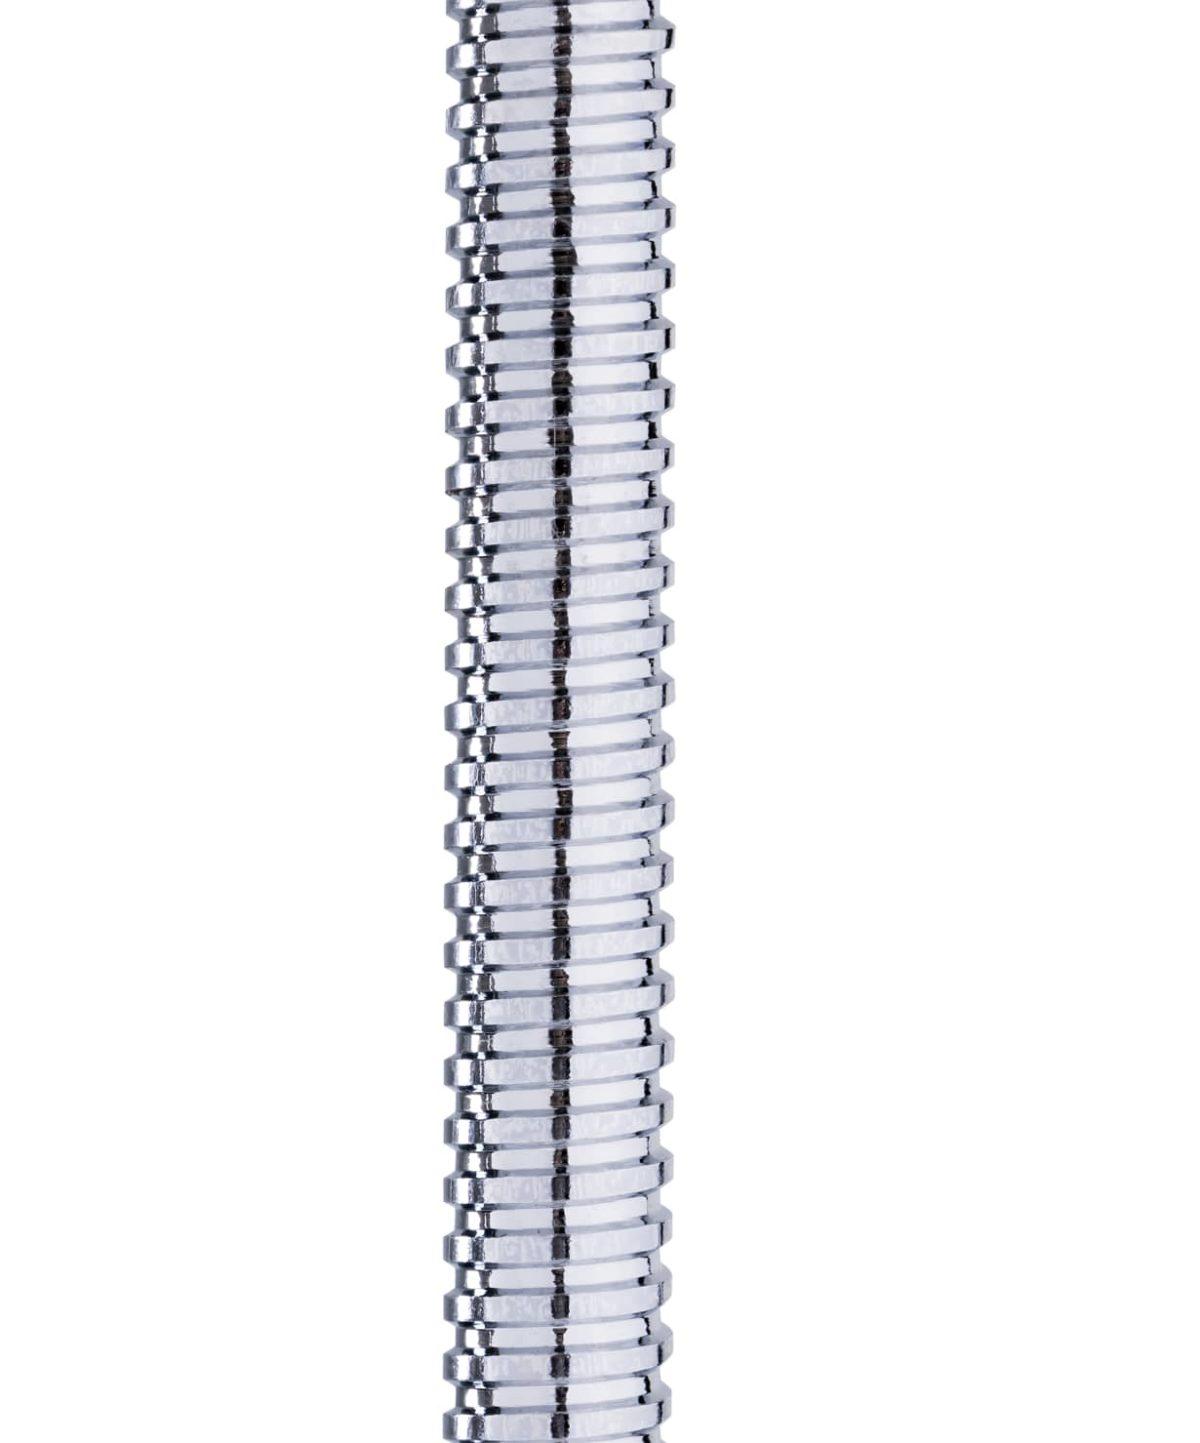 STARFIT Гриф для штанги прямой d=25мм 150см BB-103 - 3